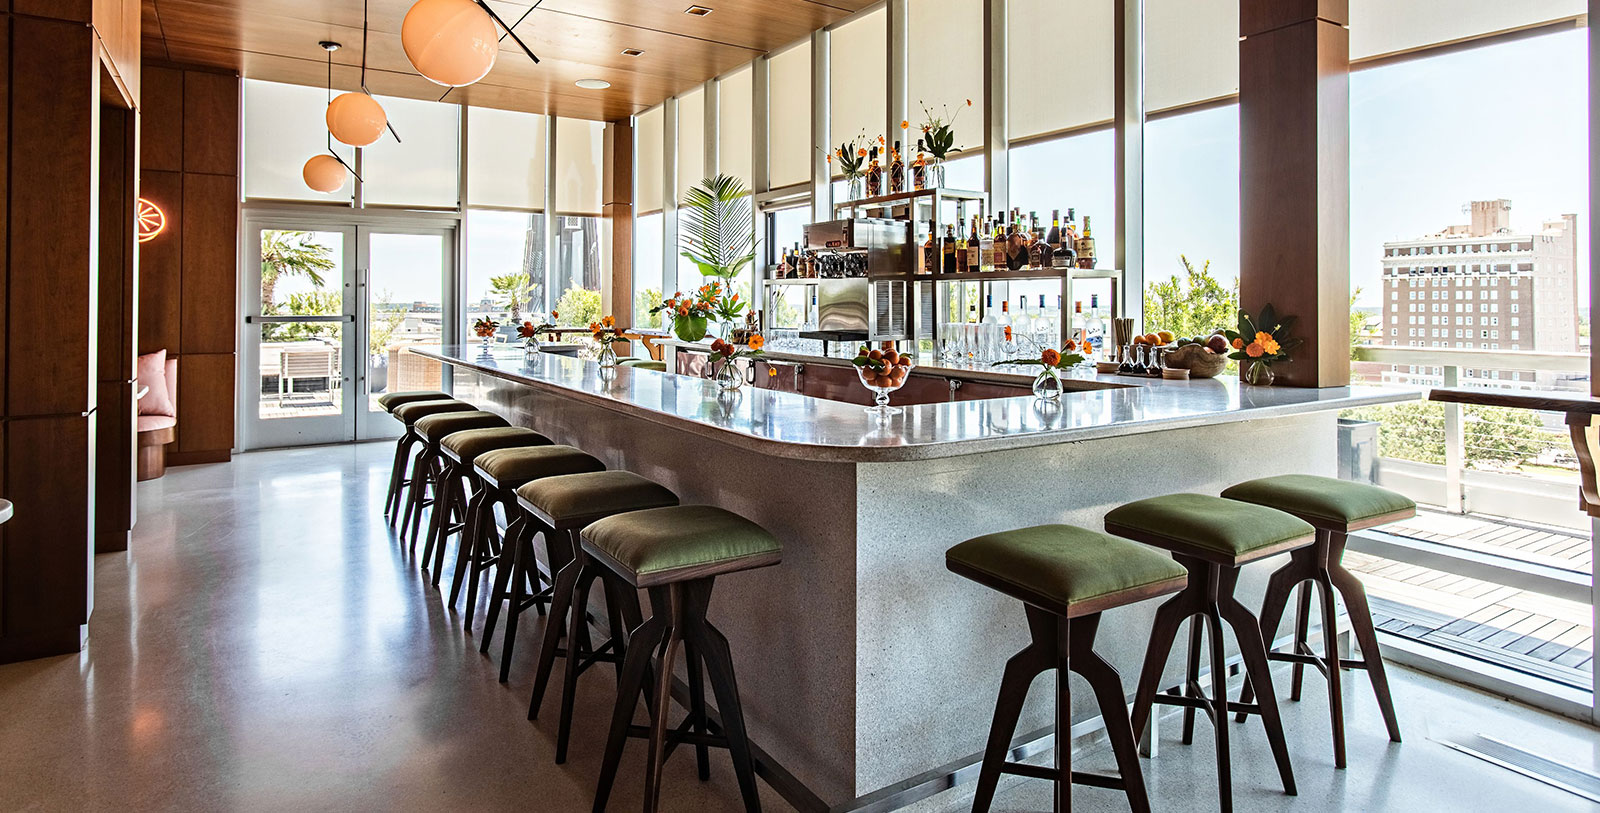 Image of Citrus Bar, The Dewberry, Charleston, South Carolina,1965, Member of Historic Hotels of America, Dining